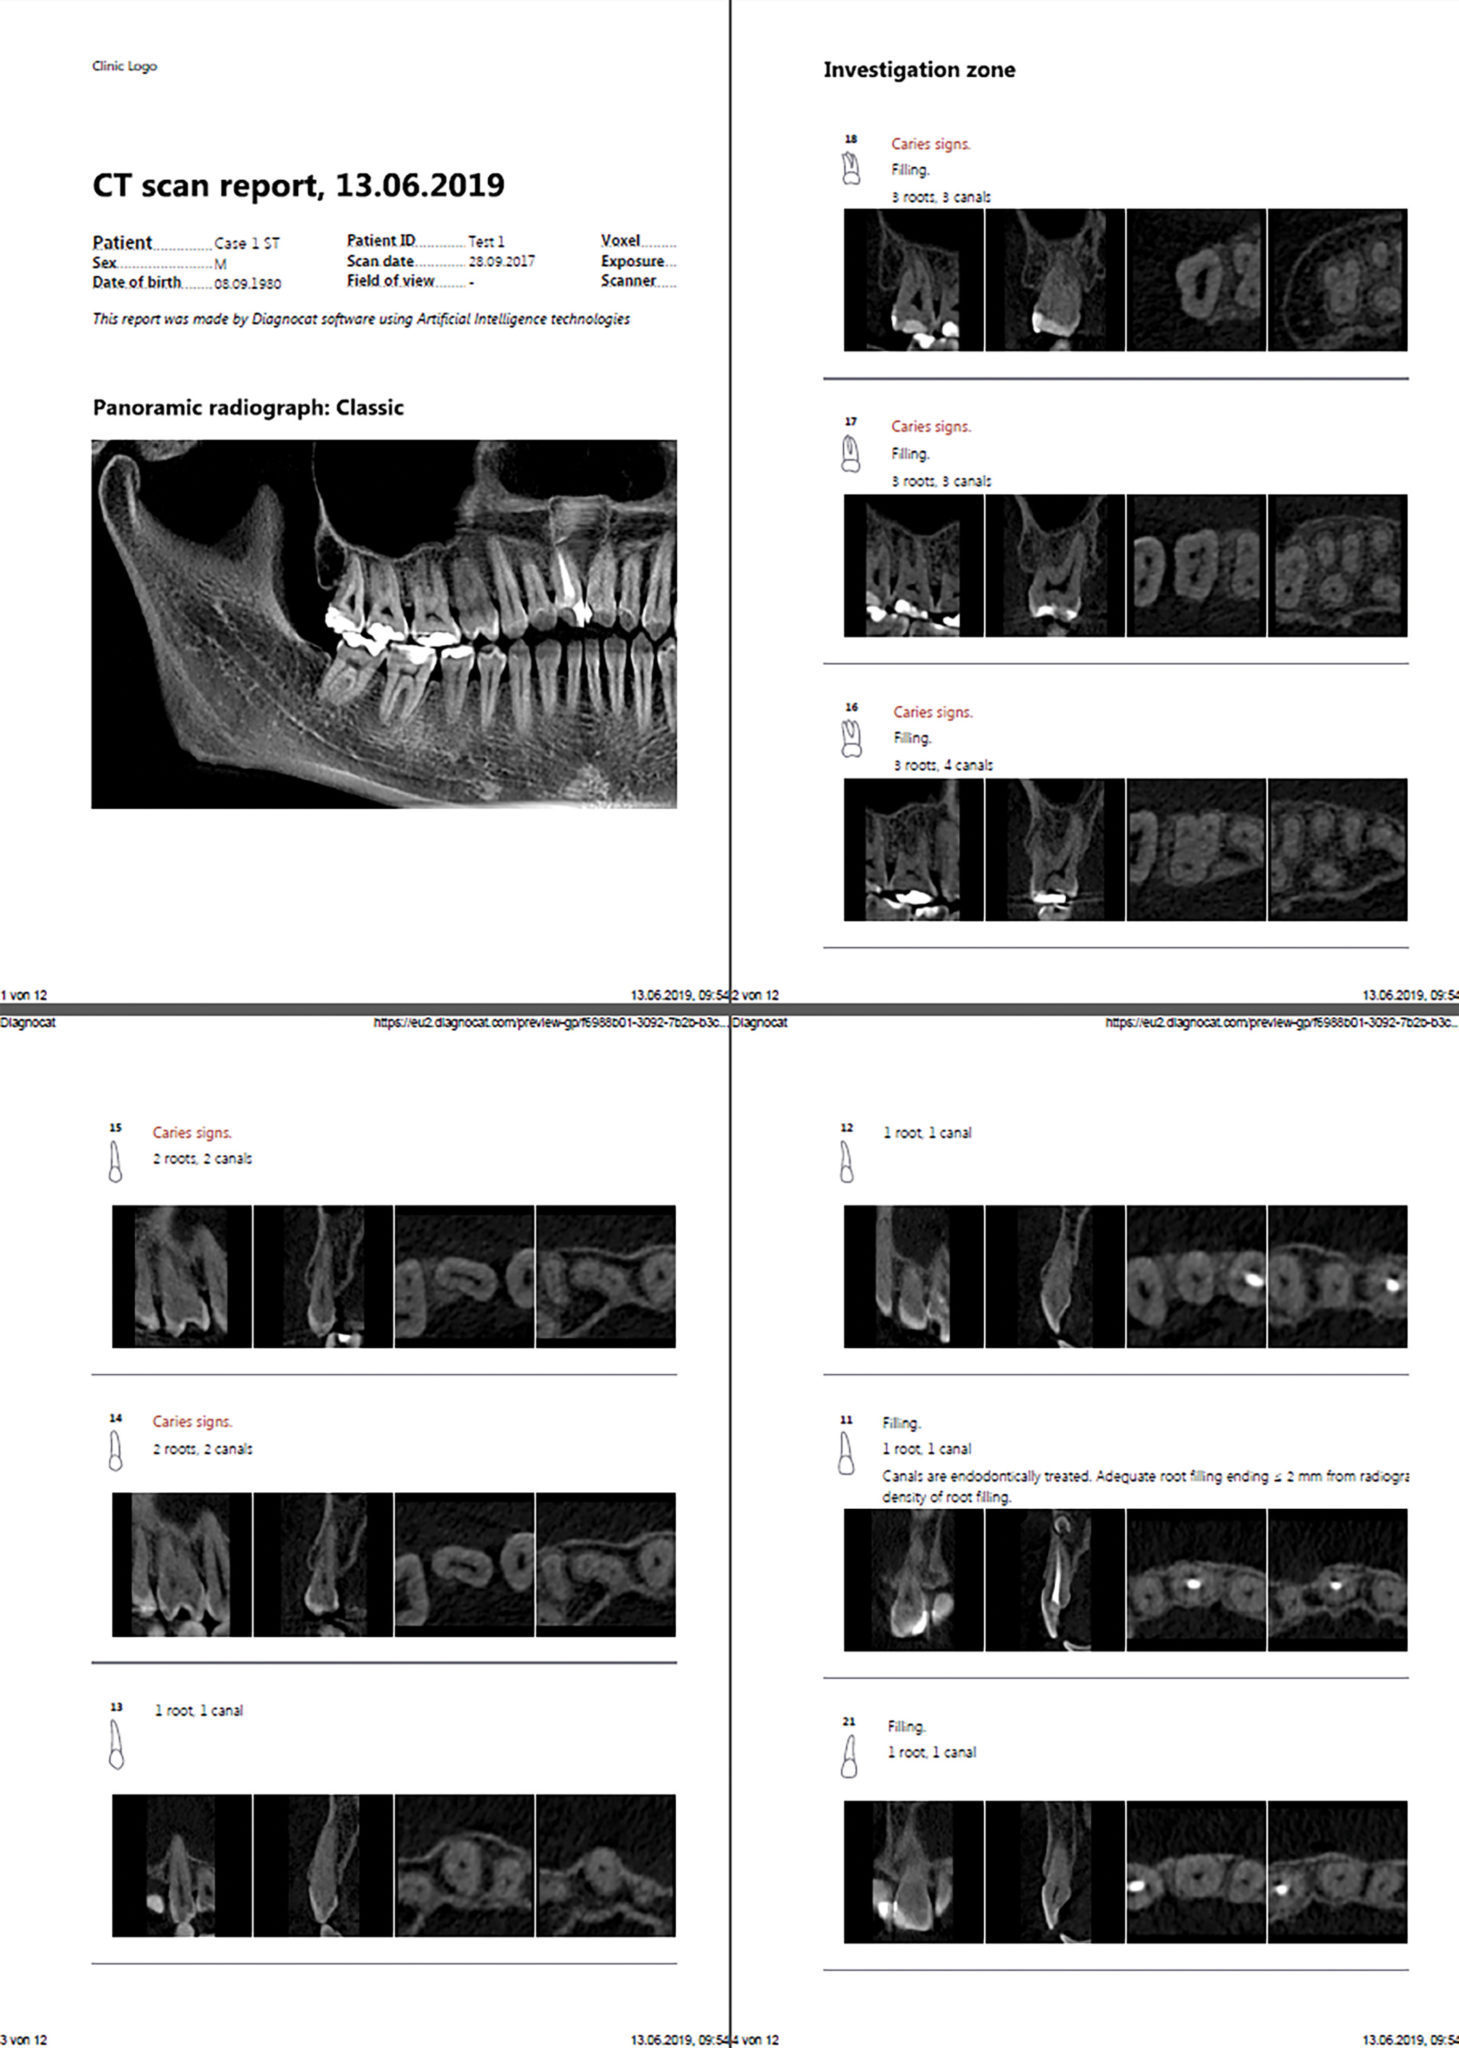 Dedicated endodontic visualization.